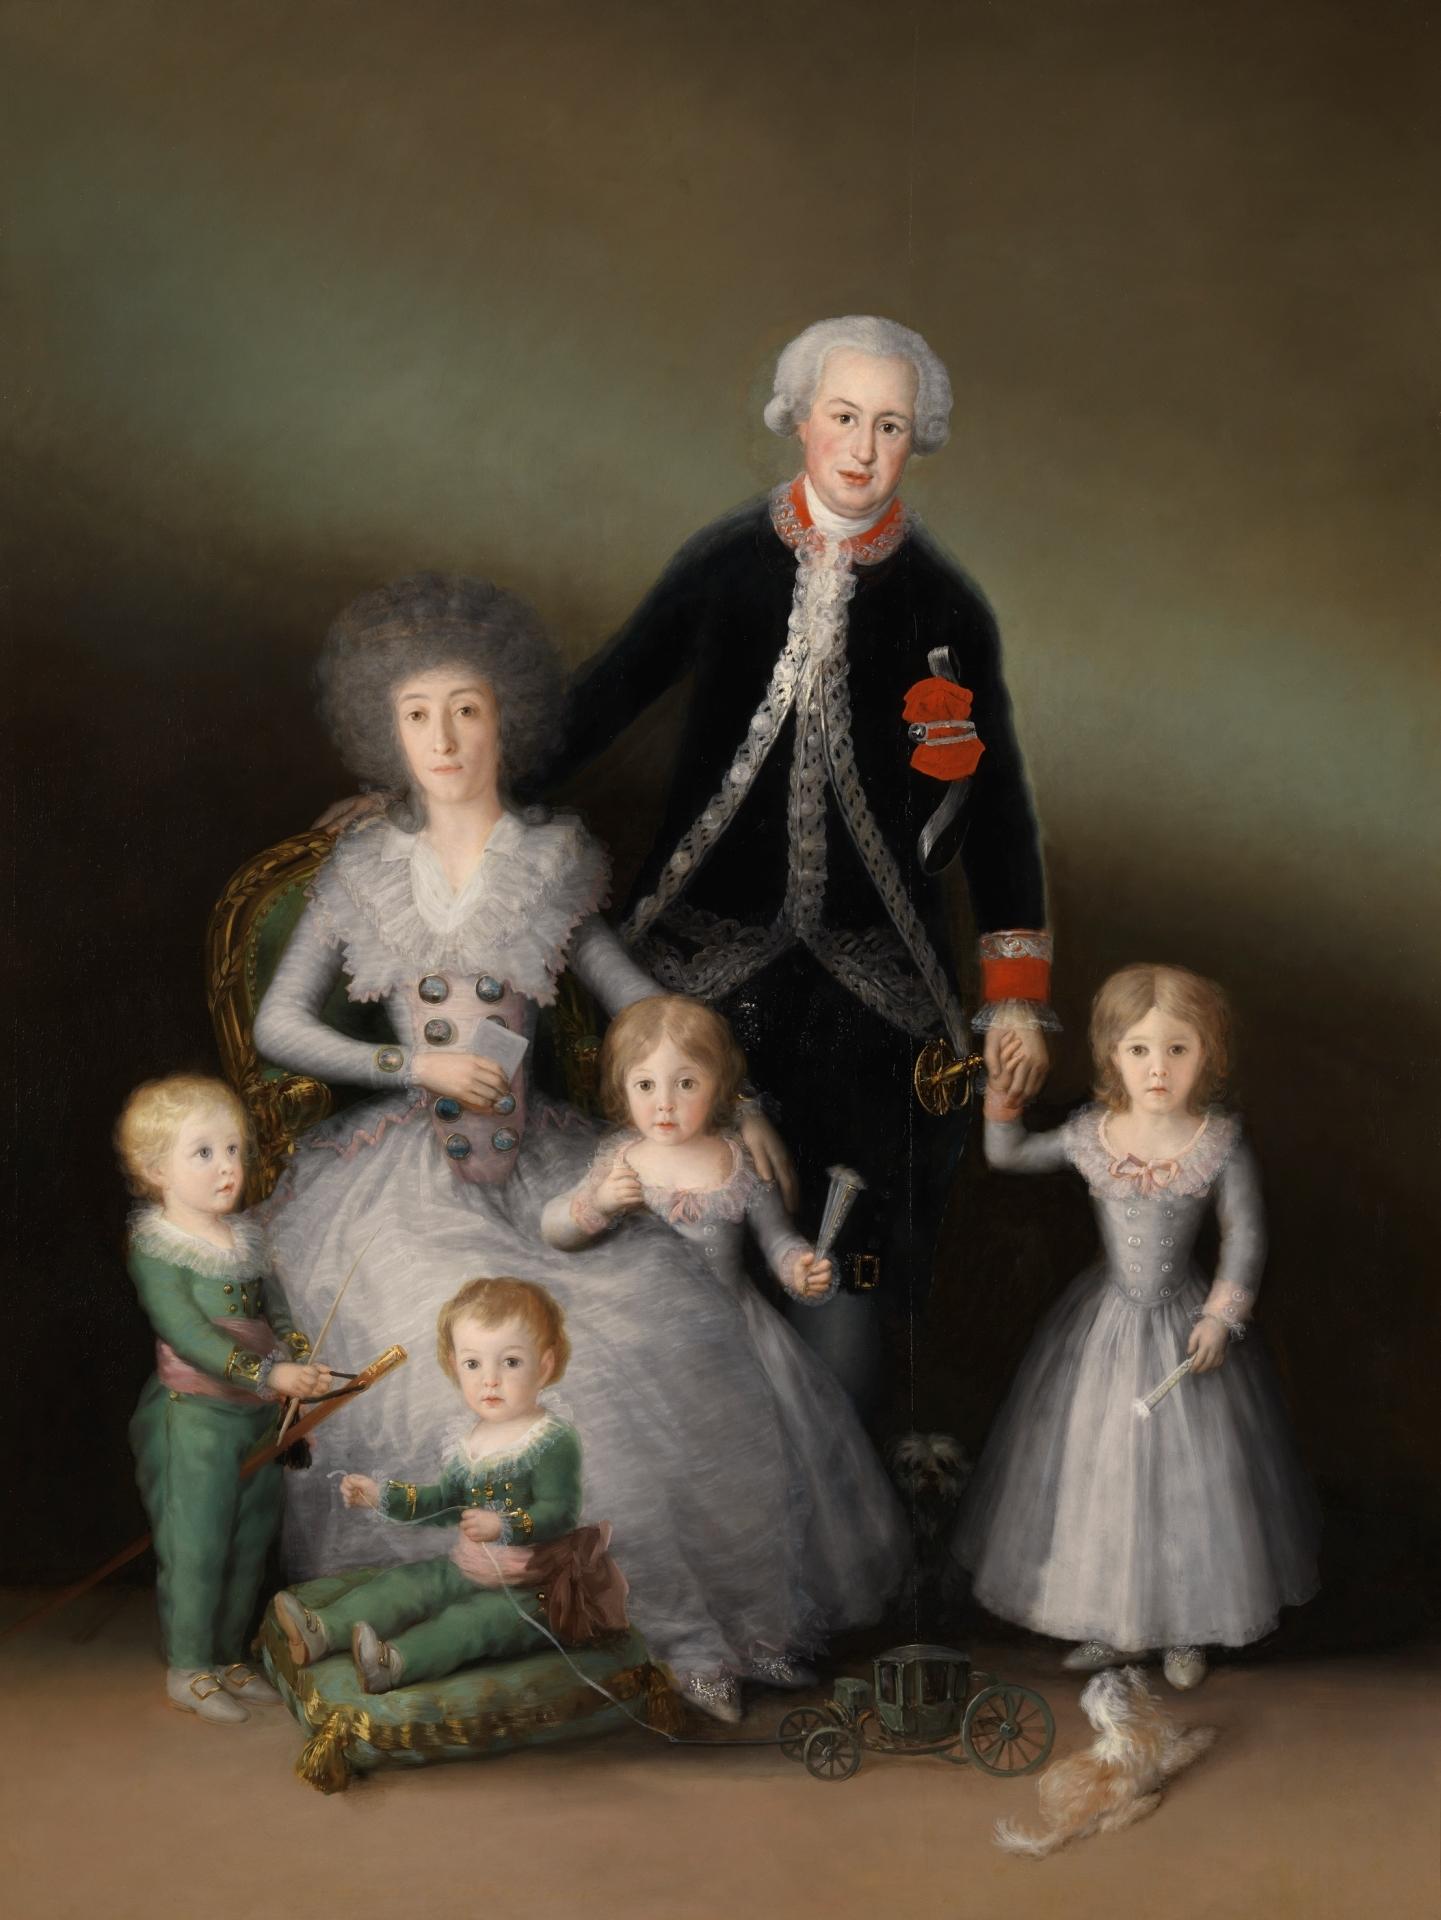 Francisco Goya, La famiglia Osuna